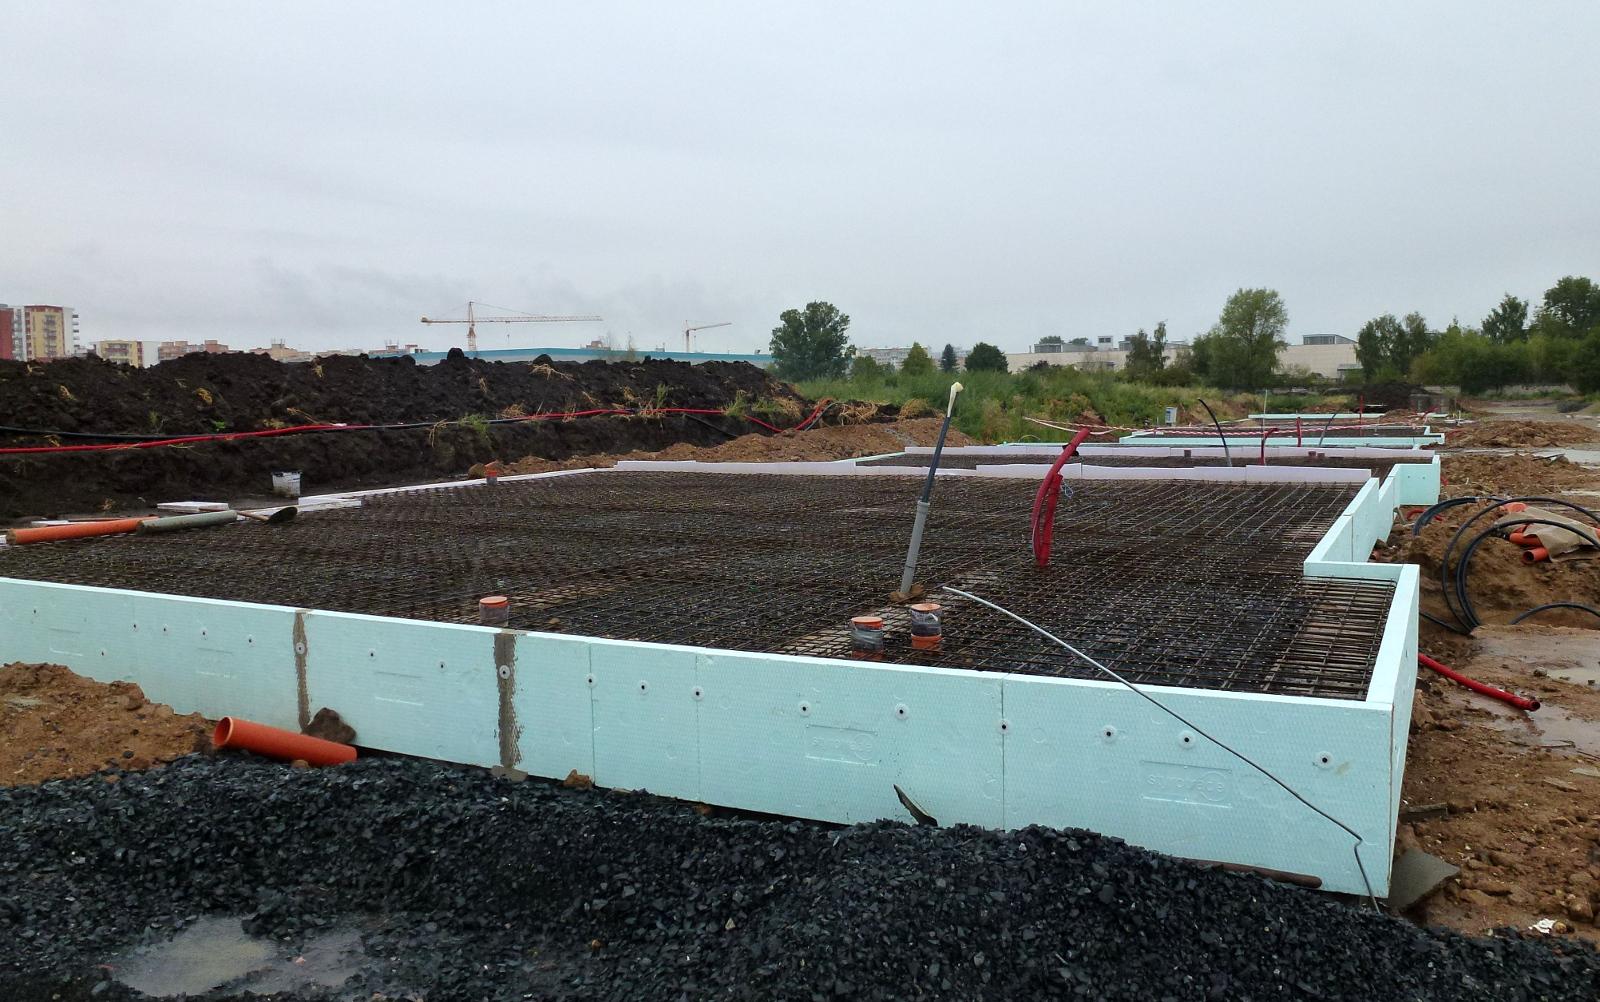 2015-08-18 Položená kari síť, bude se betonovat základová deska